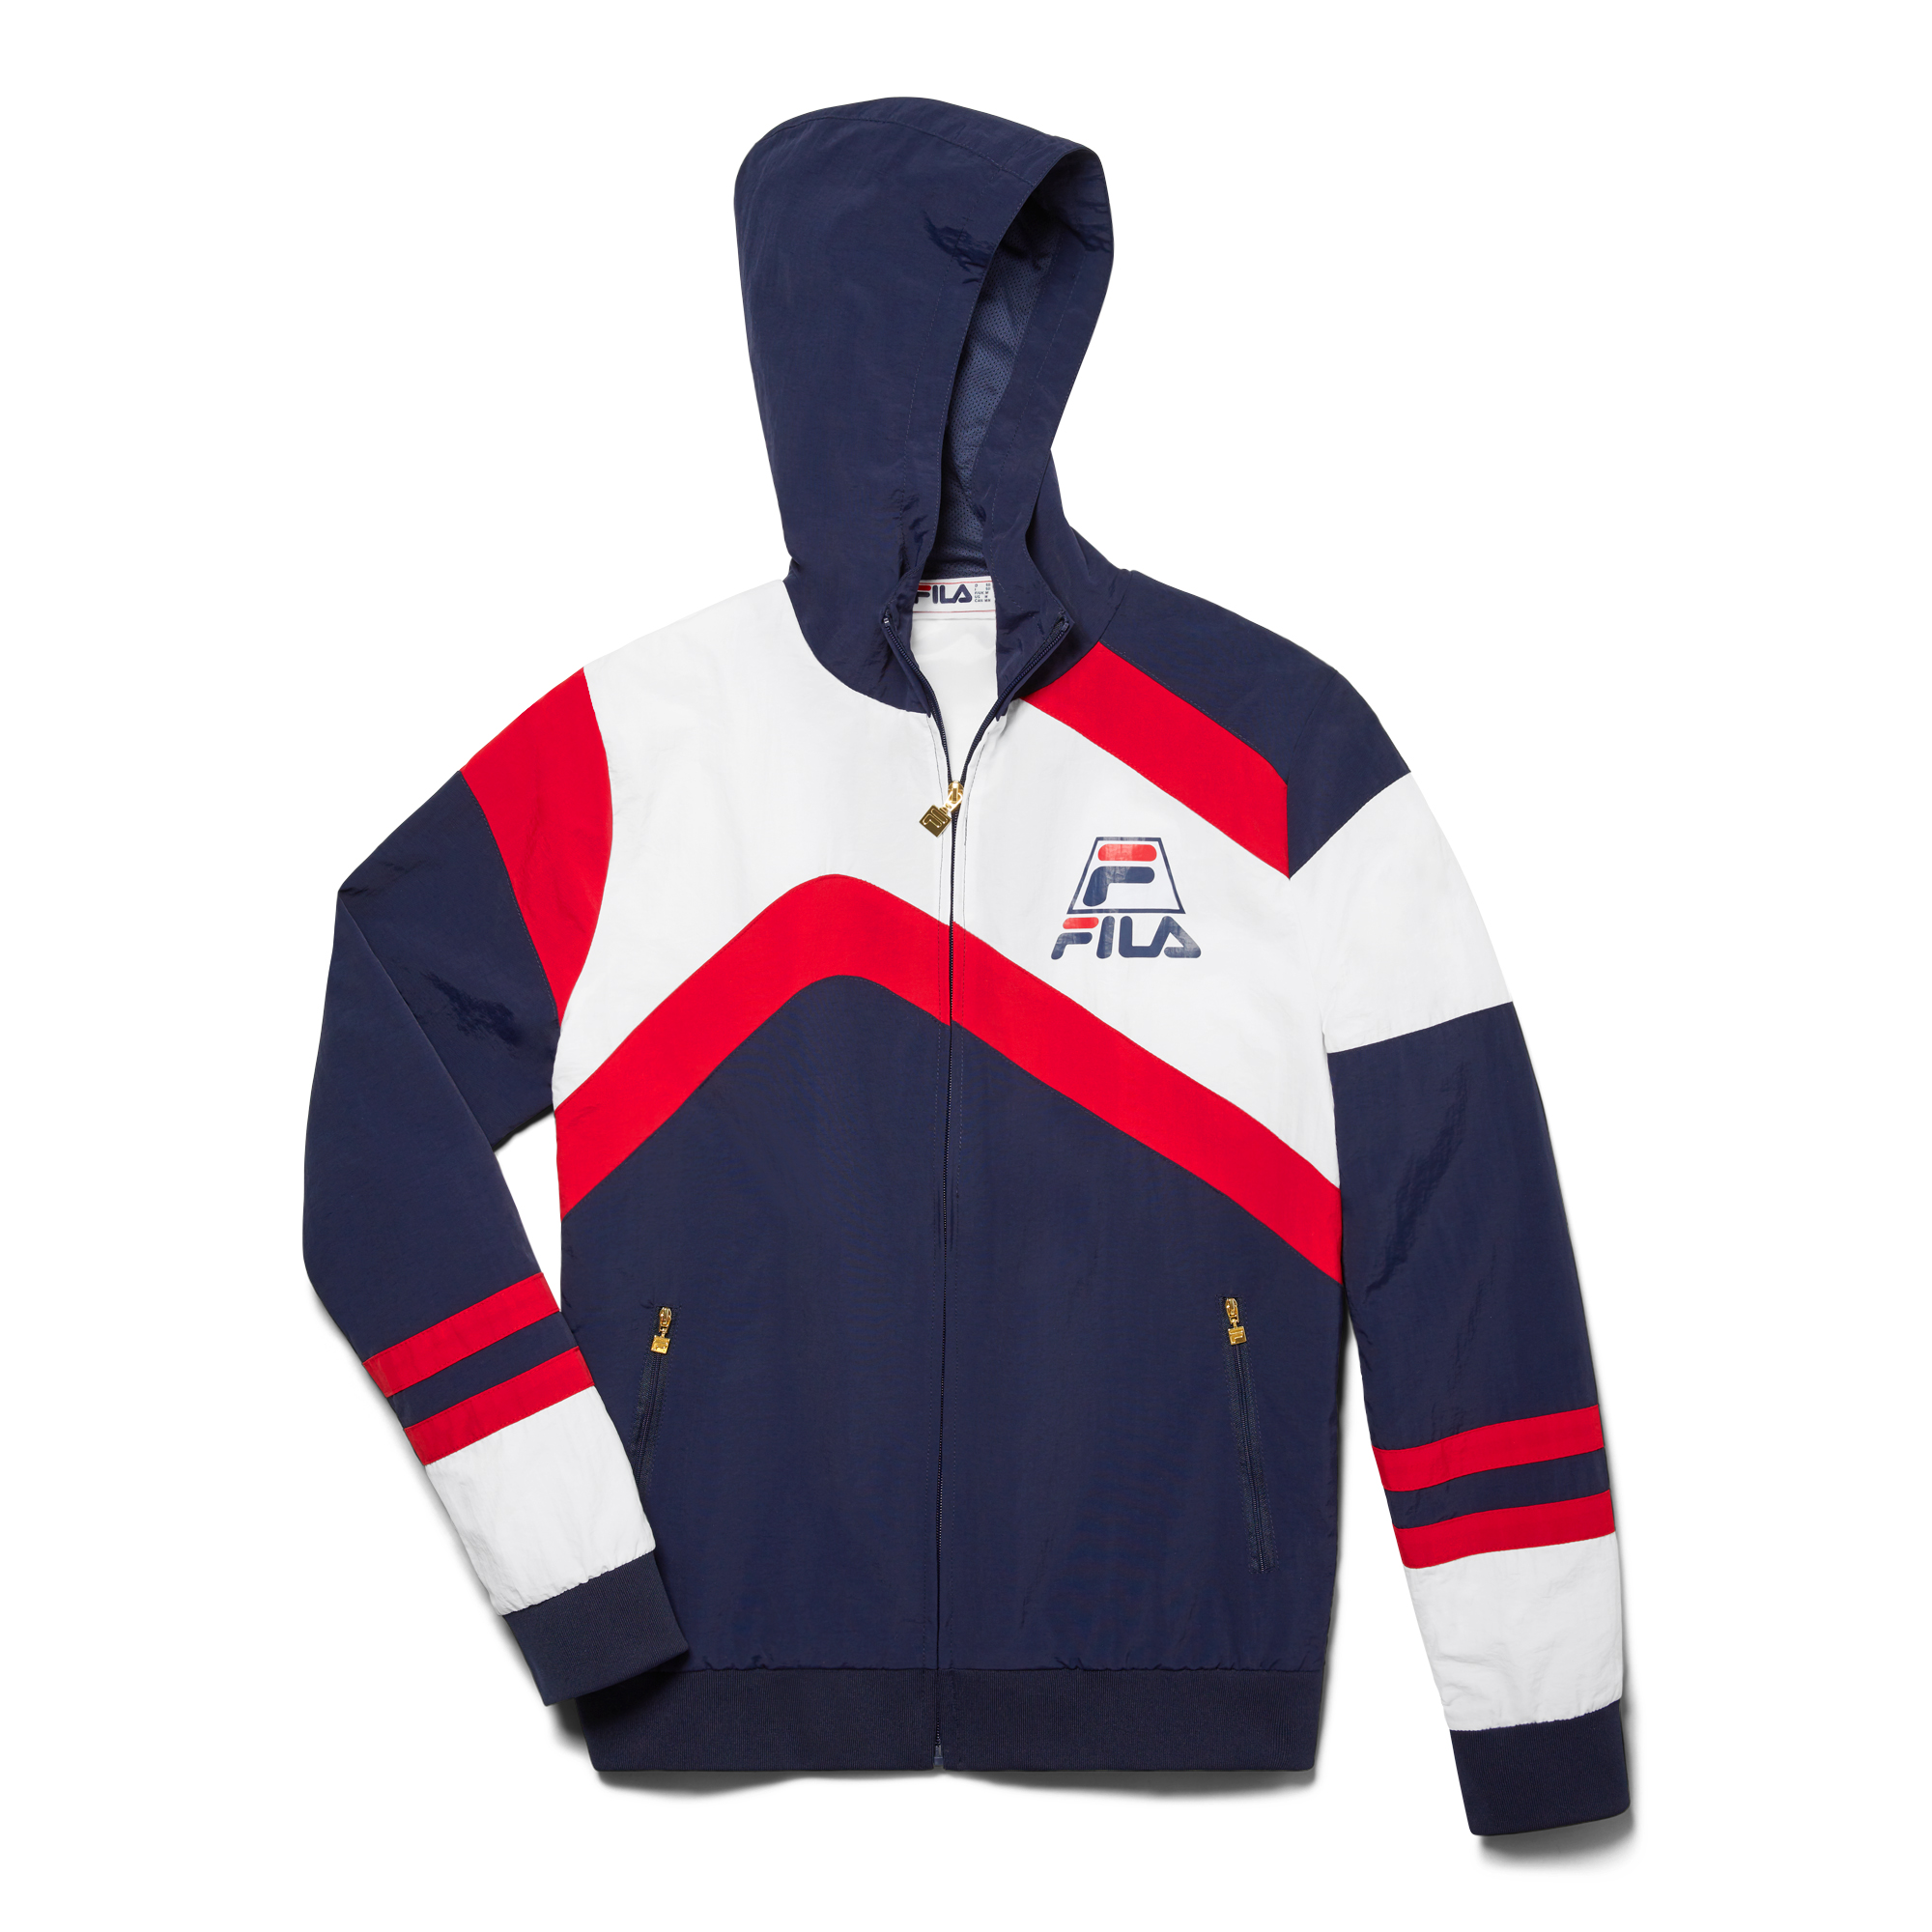 fila grant hill Zenith track jacket